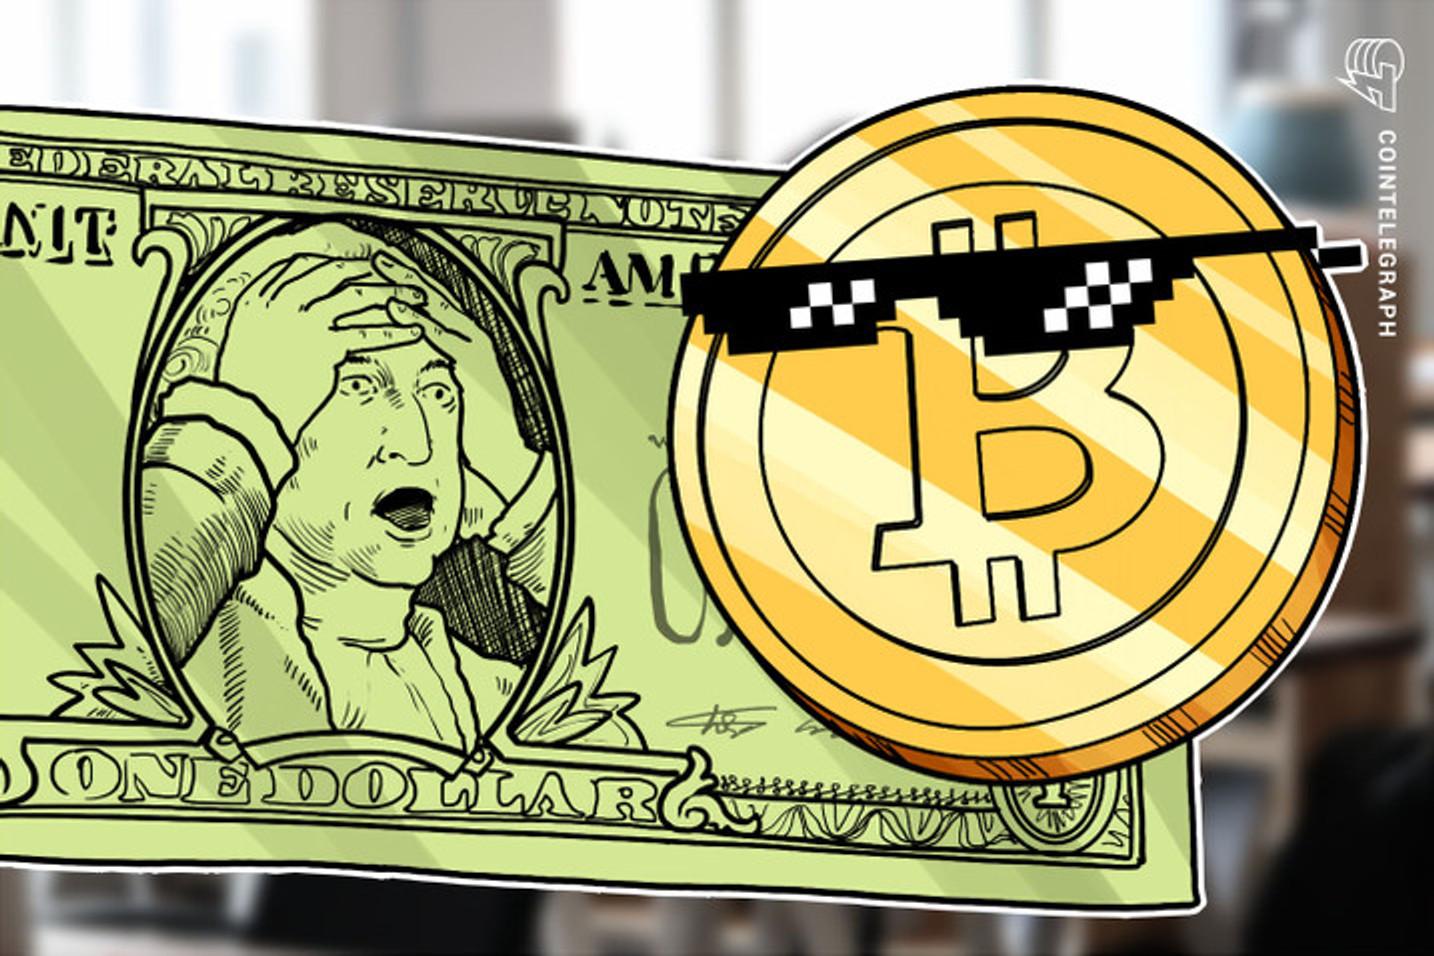 Bitcoin supera os R$ 52.000 no Brasil pela primeira vez desde o início de 2018